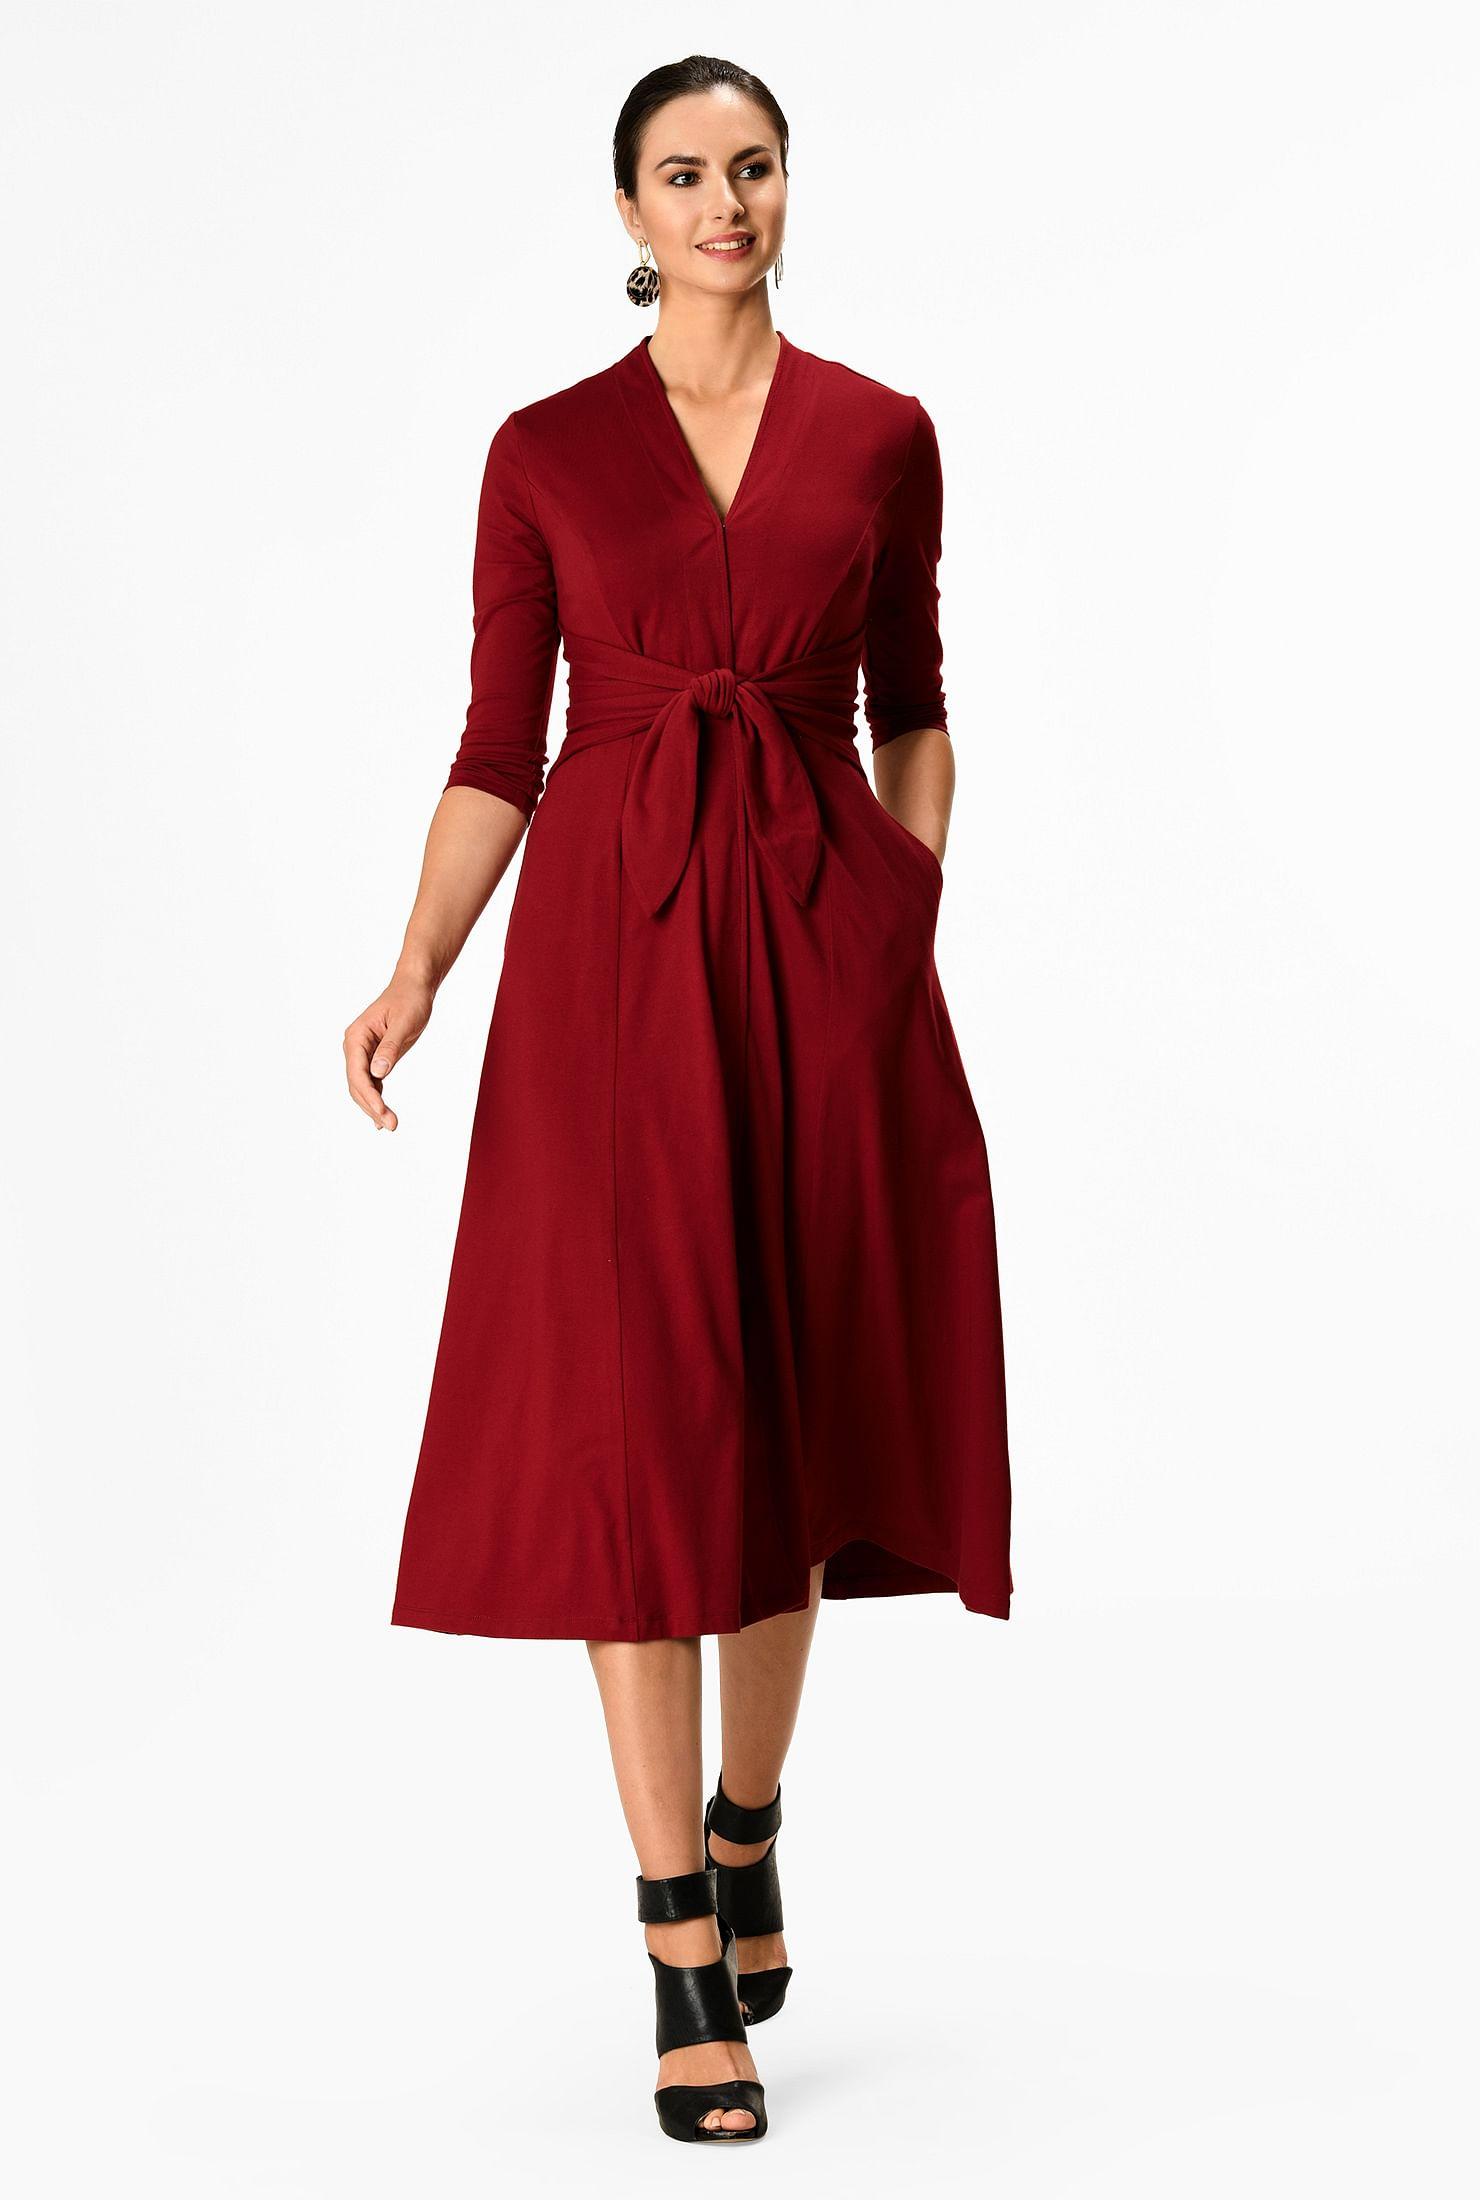 Tie-front cotton knit  midi dress